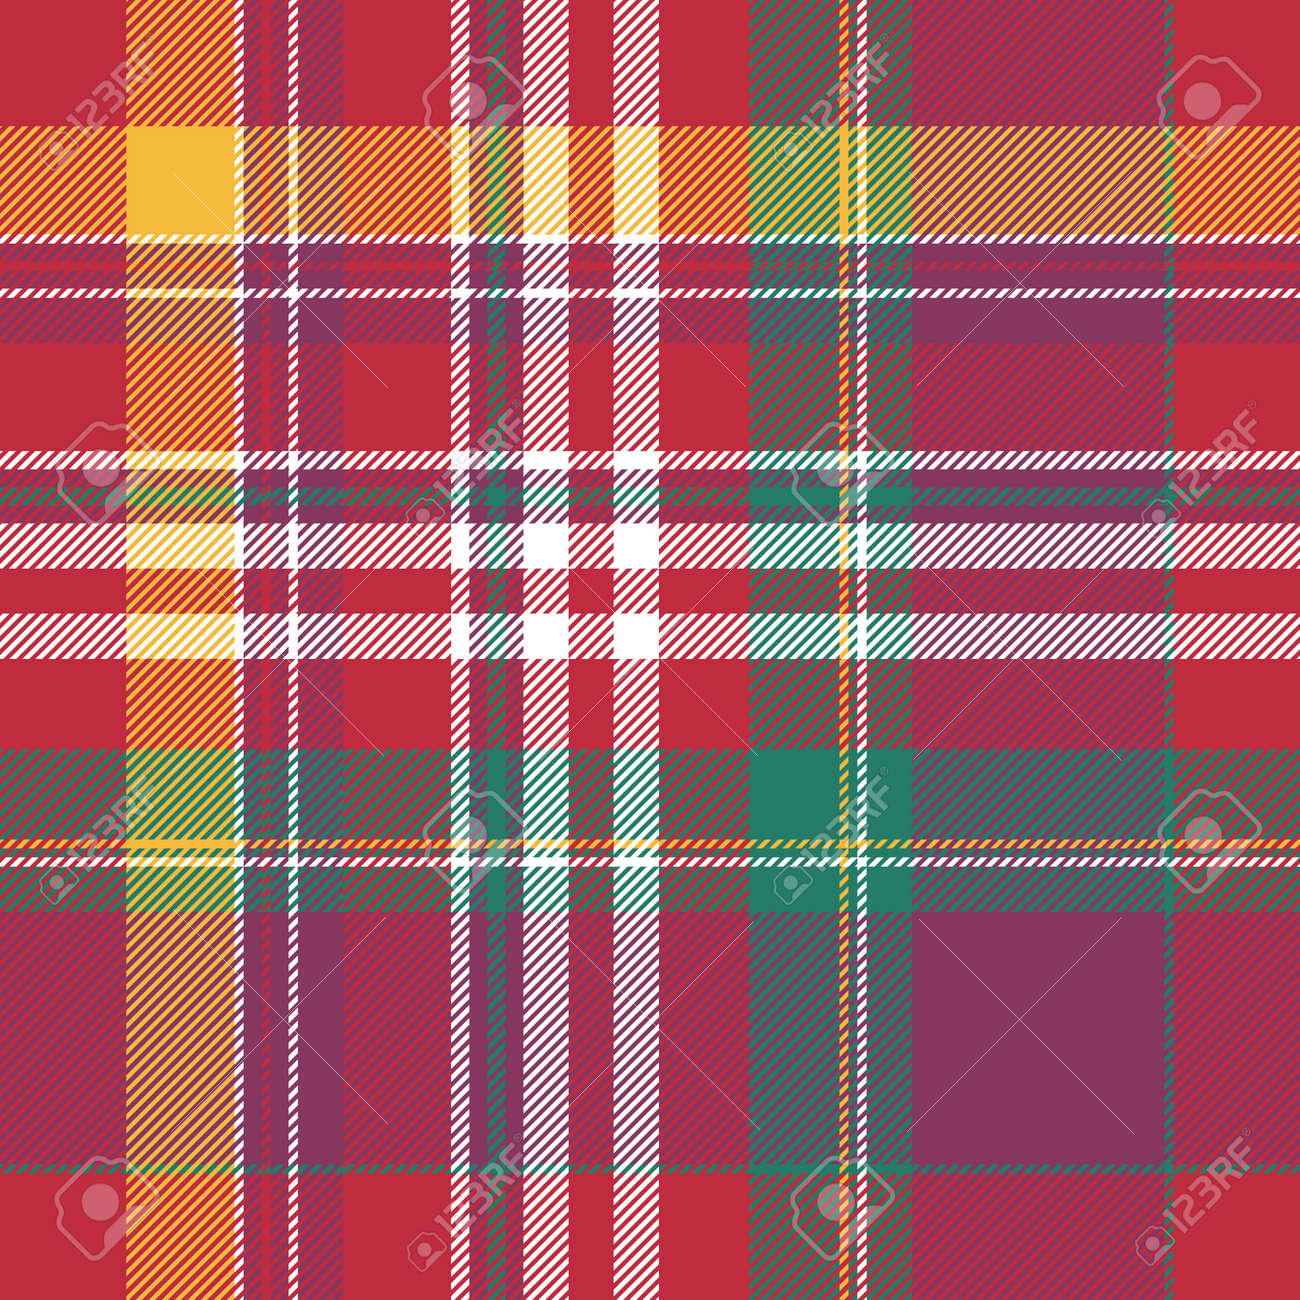 006b4f67f Modelo inconsútil del tartán rosado de la tela escocesa. Ilustracion  vectorial